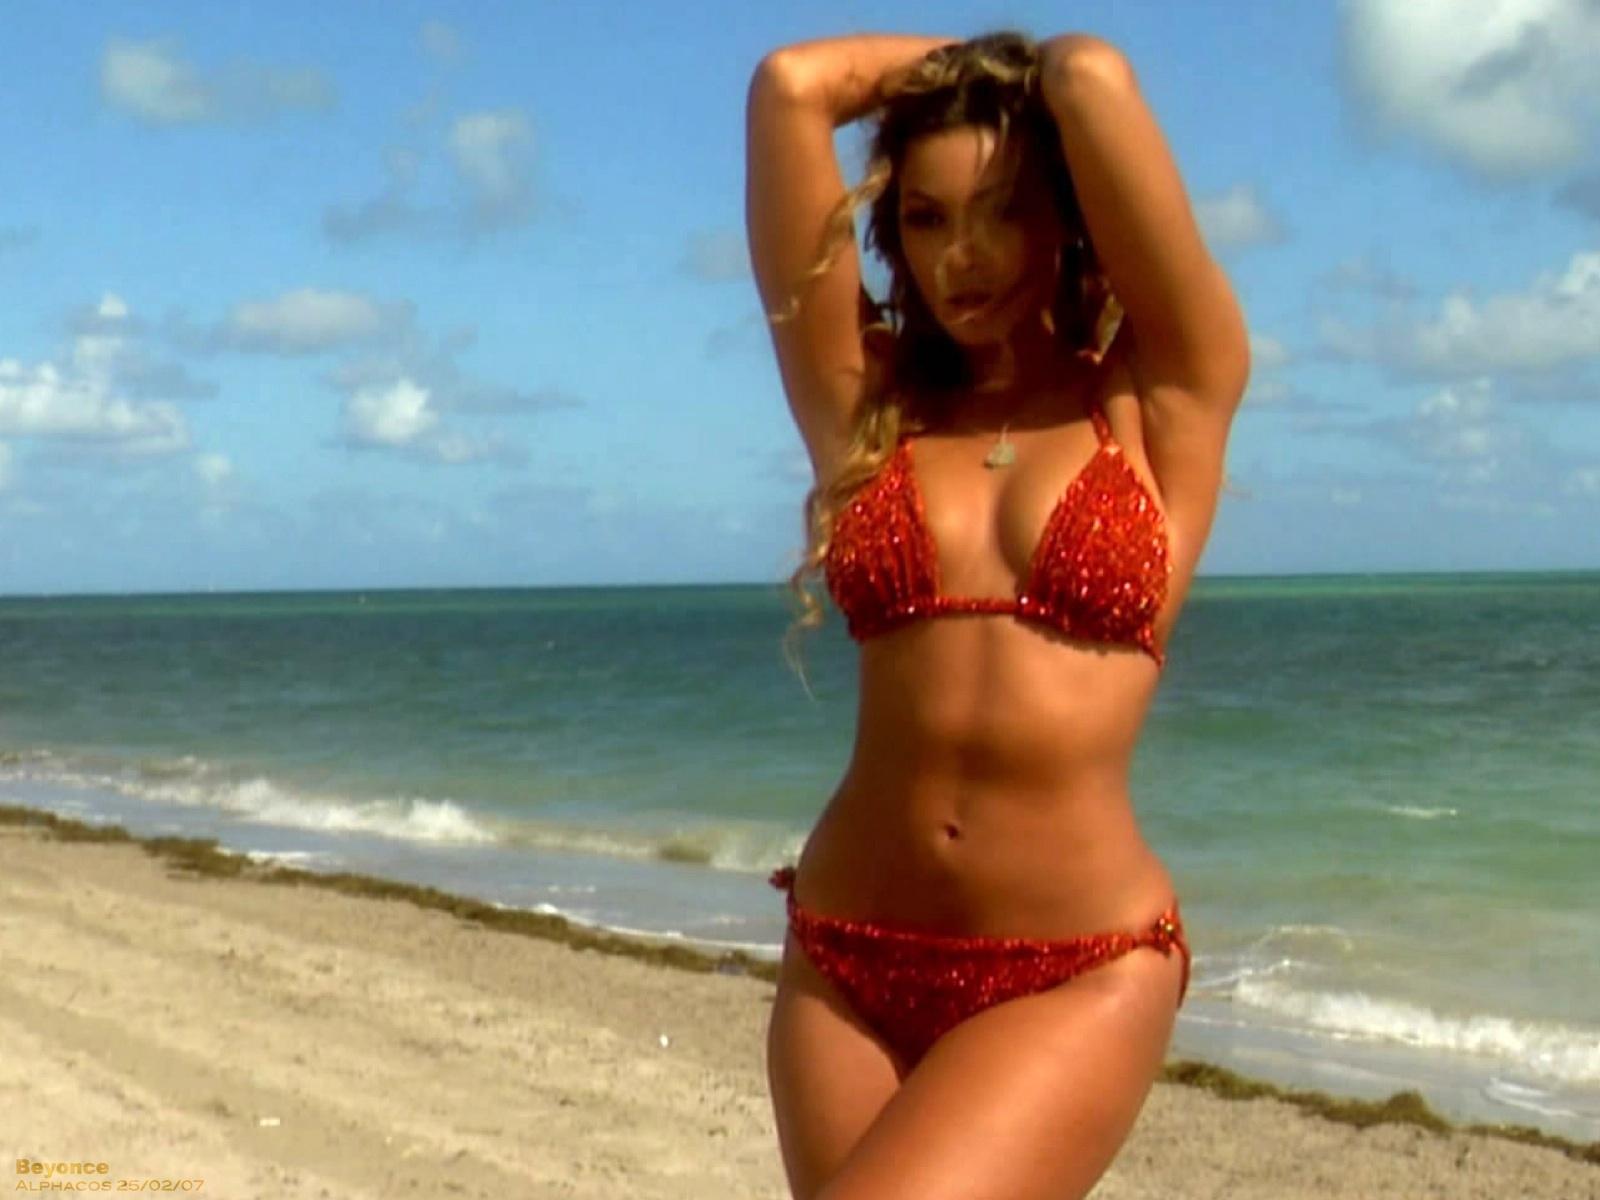 http://2.bp.blogspot.com/_UVM4e58xd5g/TF-blS1vefI/AAAAAAAAADU/Dw-FkOvVInQ/s1600/beyonce_knowles_in_bikini_beach-normal.jpg